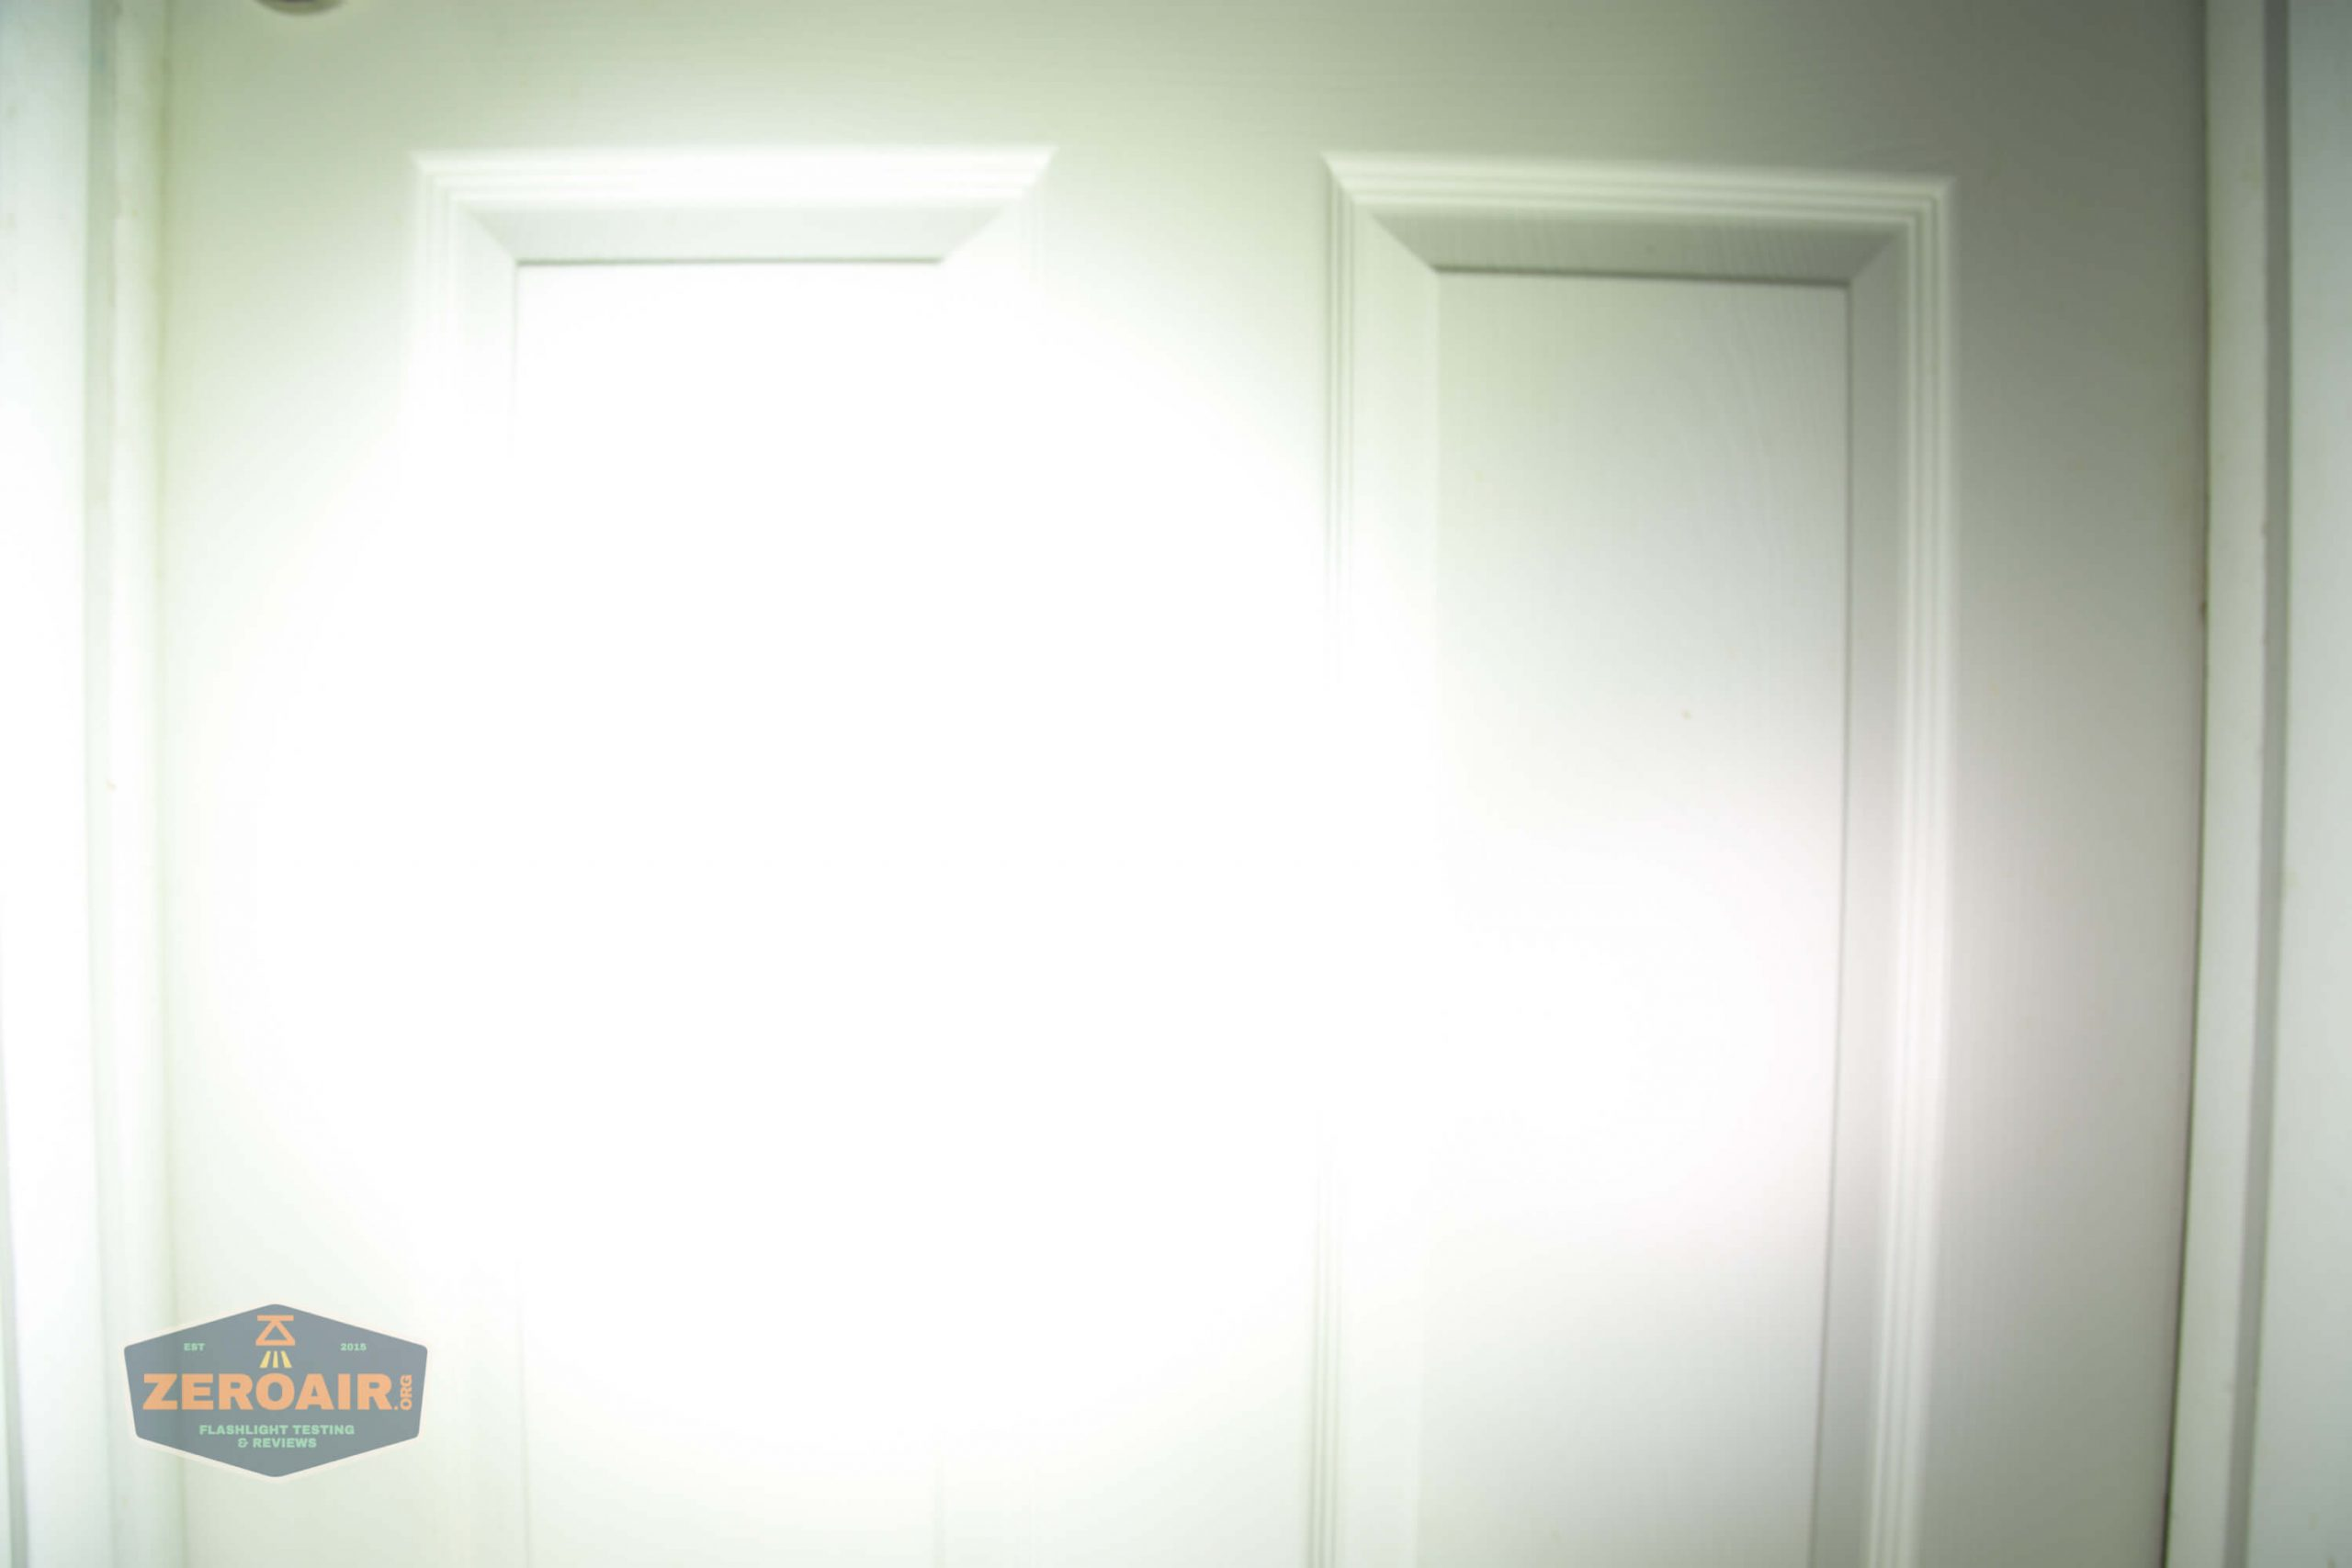 countycomm reylight 21700 quad emitter flashlight beamshot door 4